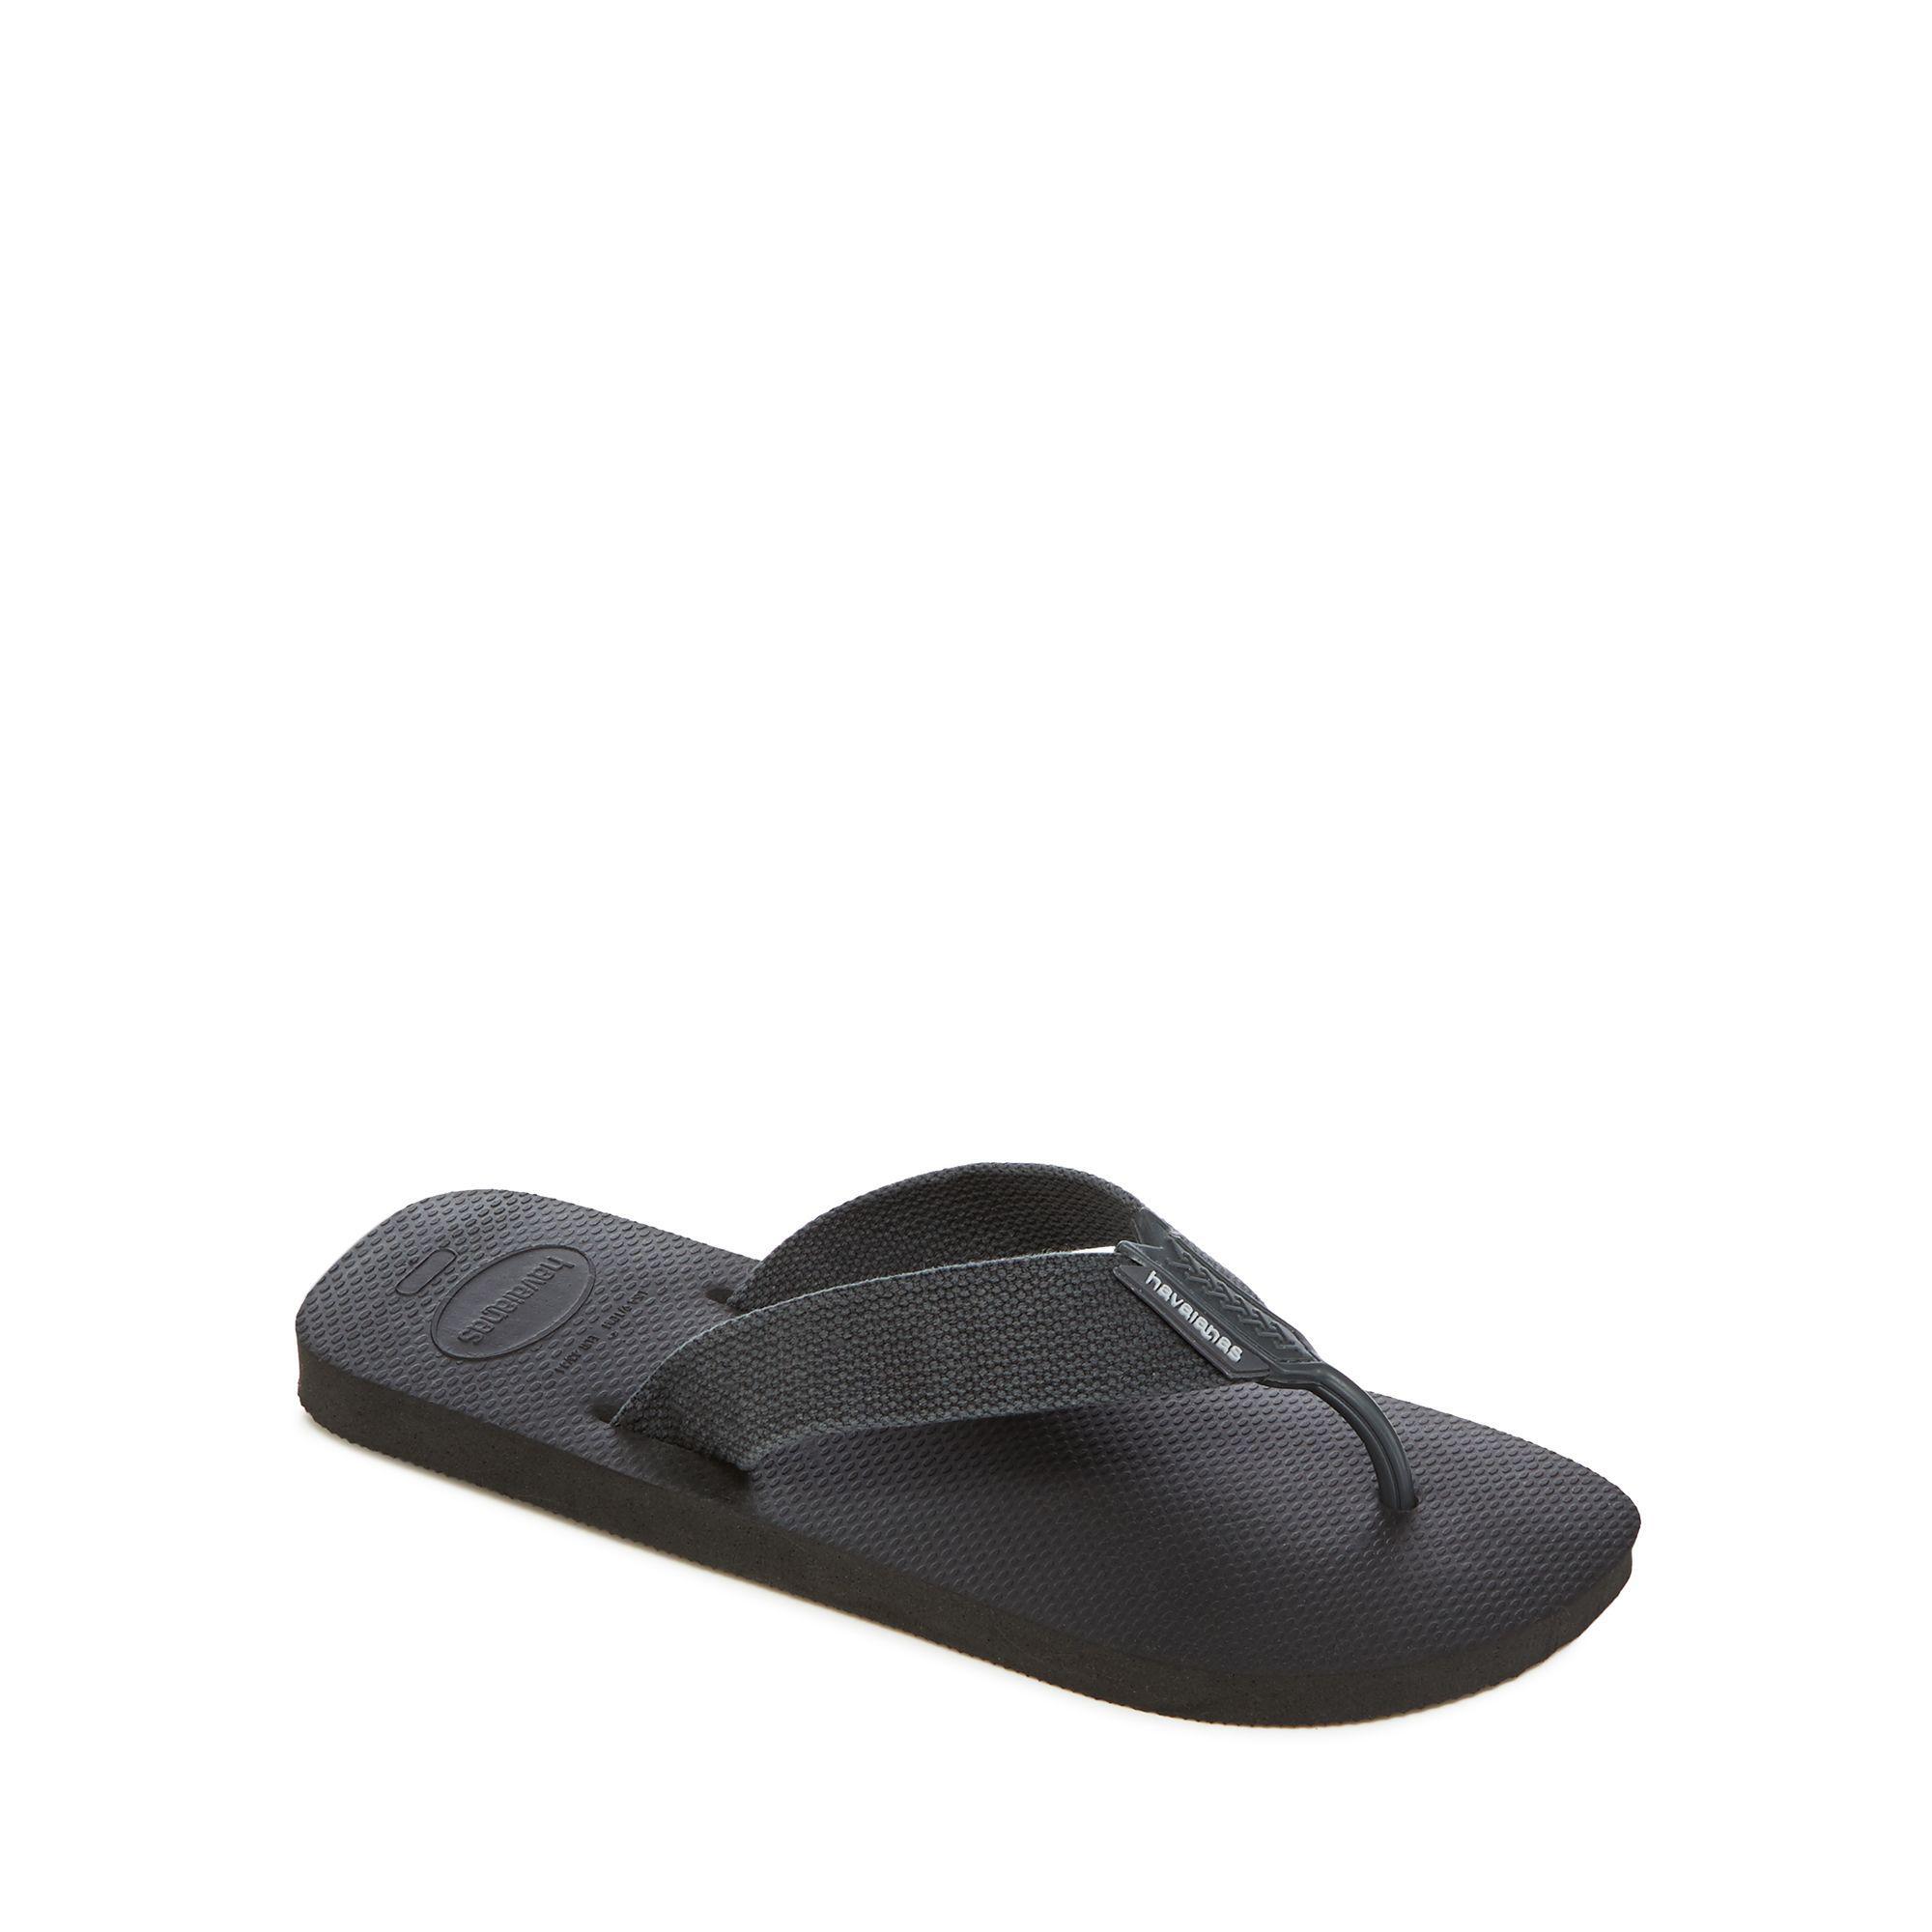 1322c892b6ae Havaianas Grey Canvas  urban  Flip Flops in Black for Men - Lyst